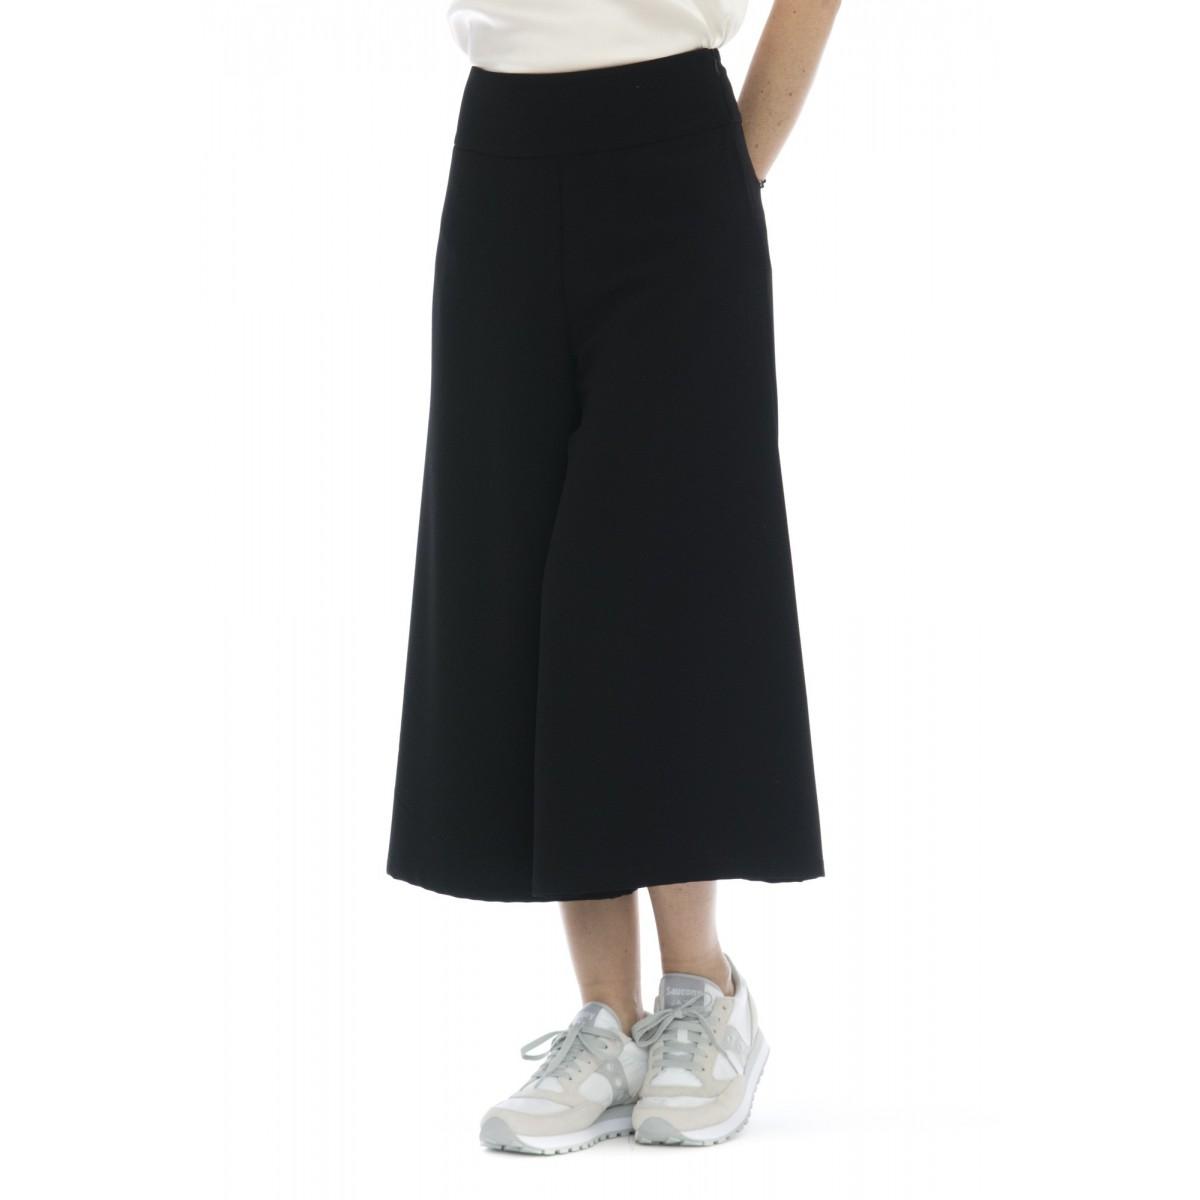 Pantalone donna - 145100 panta gonna